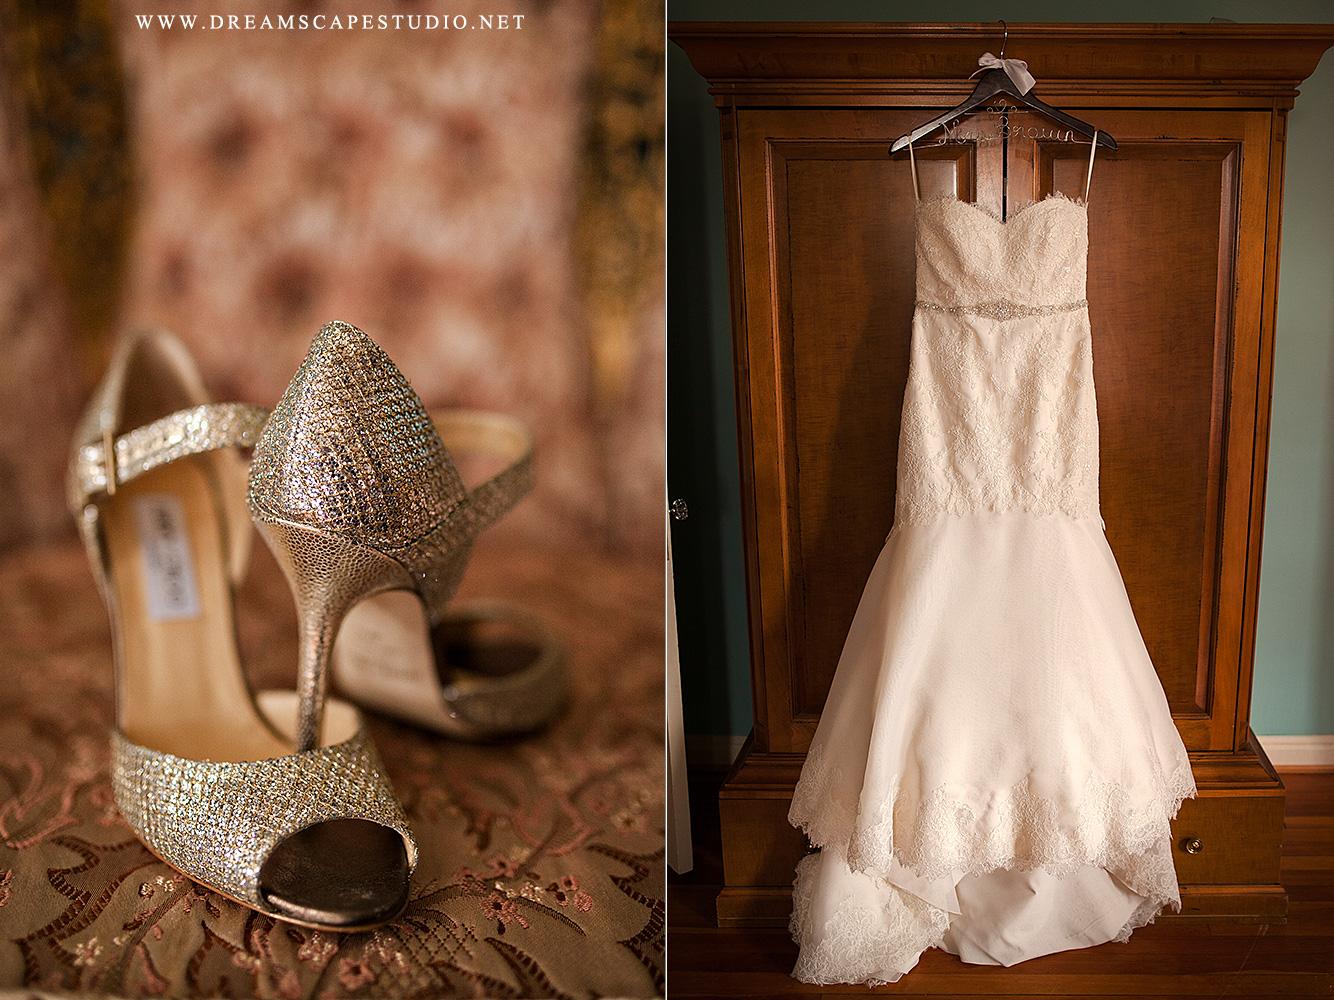 NY_Wedding_Photographer_AsEr_02.jpg